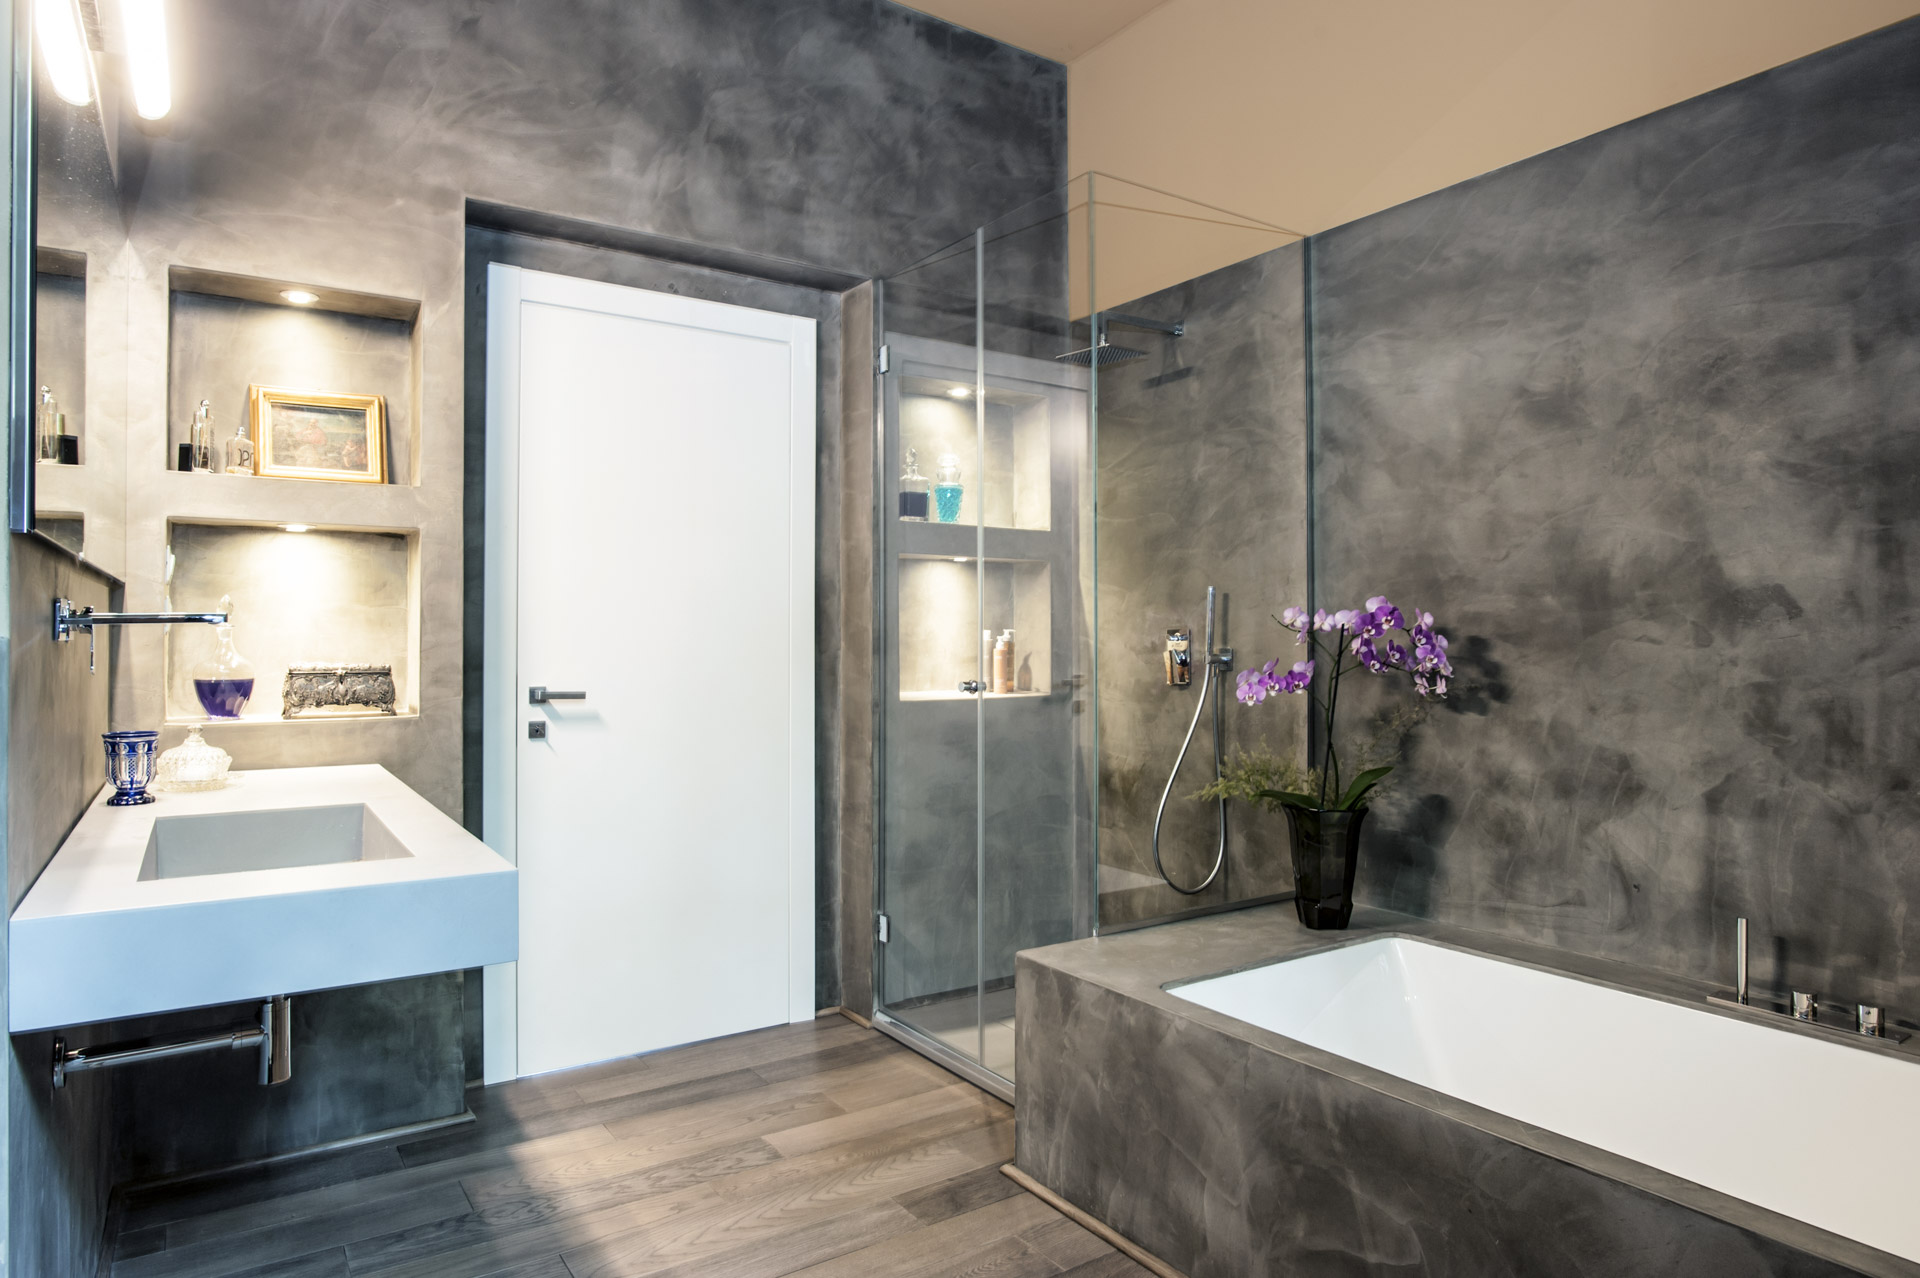 chiara-castellli-casa-bagno3 vasca.jpg